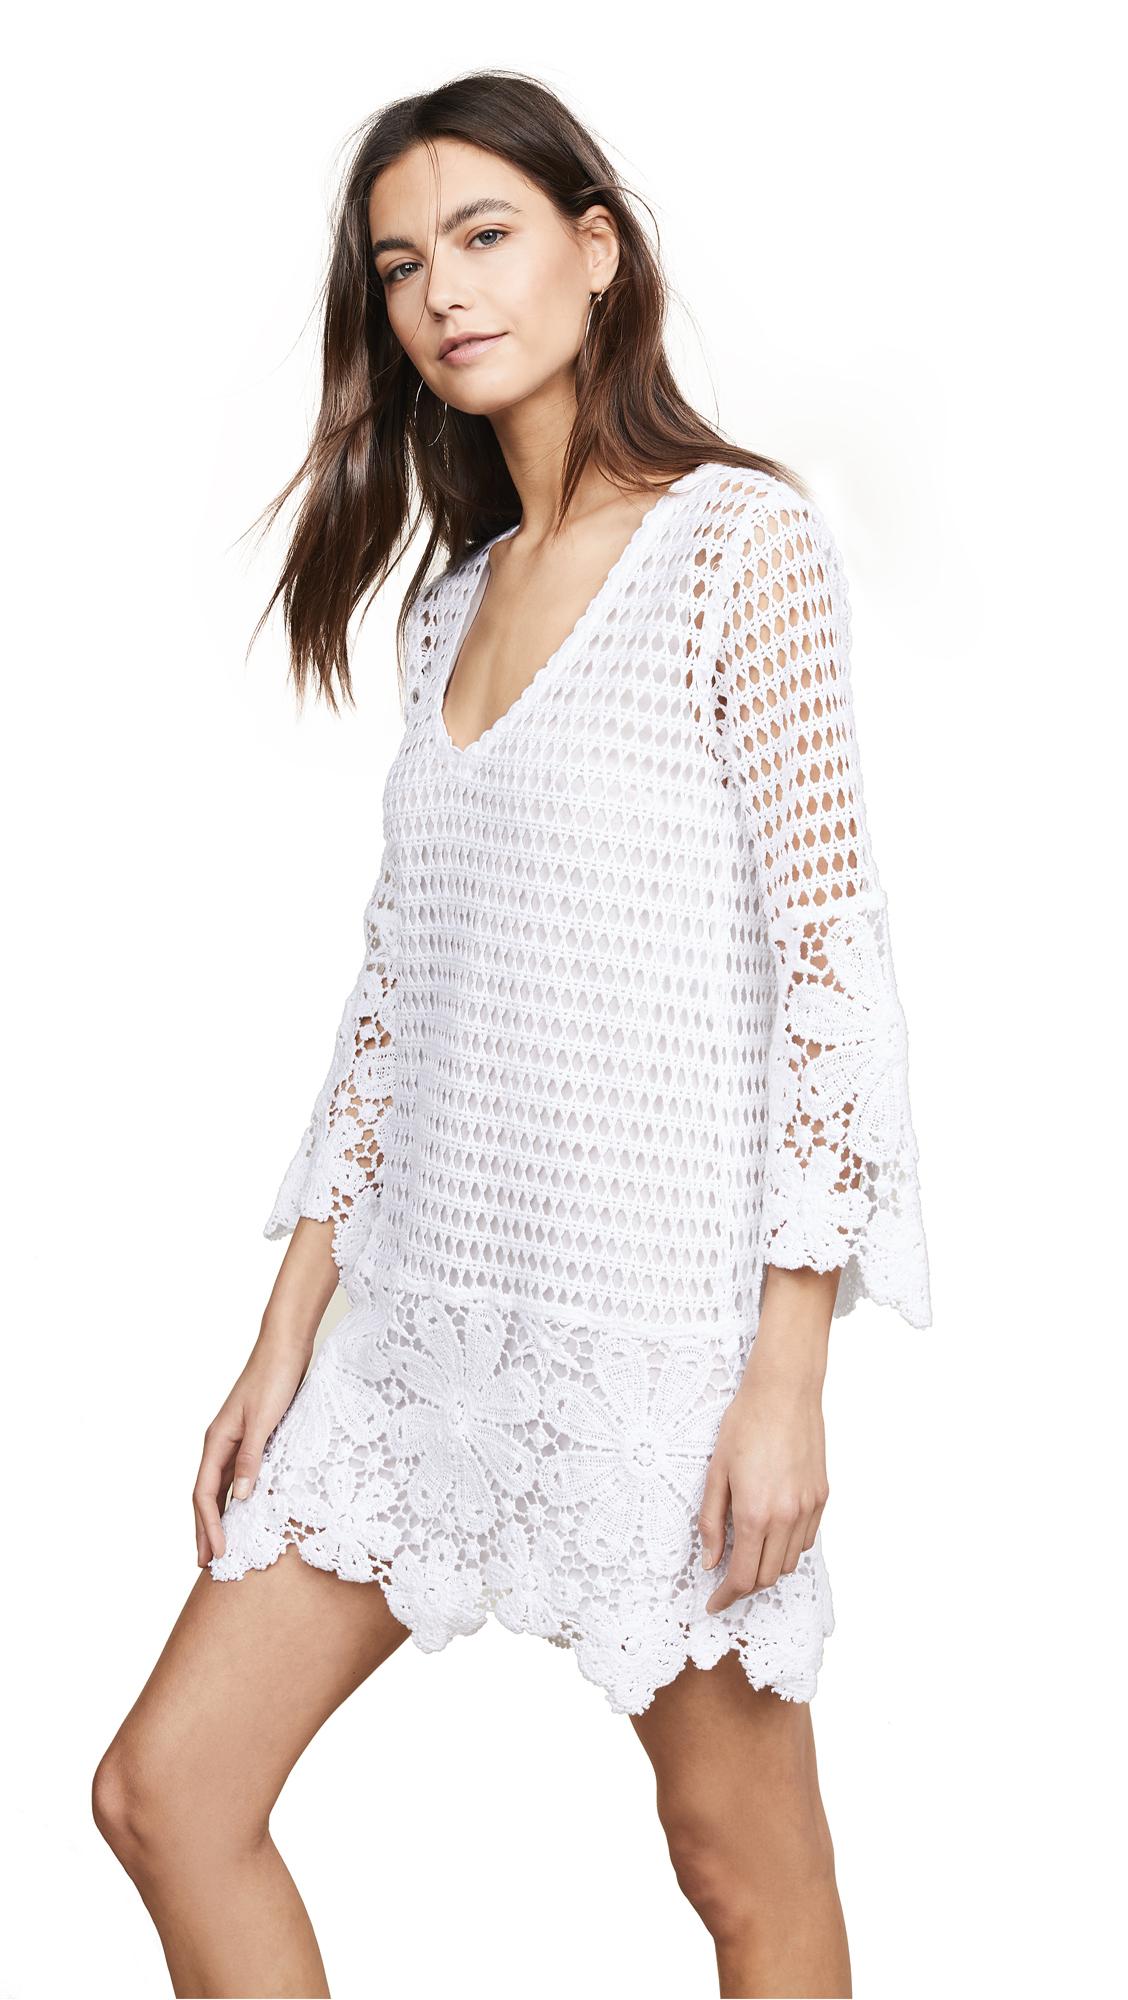 8655d064f3 Temptation Positano Cosenza Retro Crochet Dress